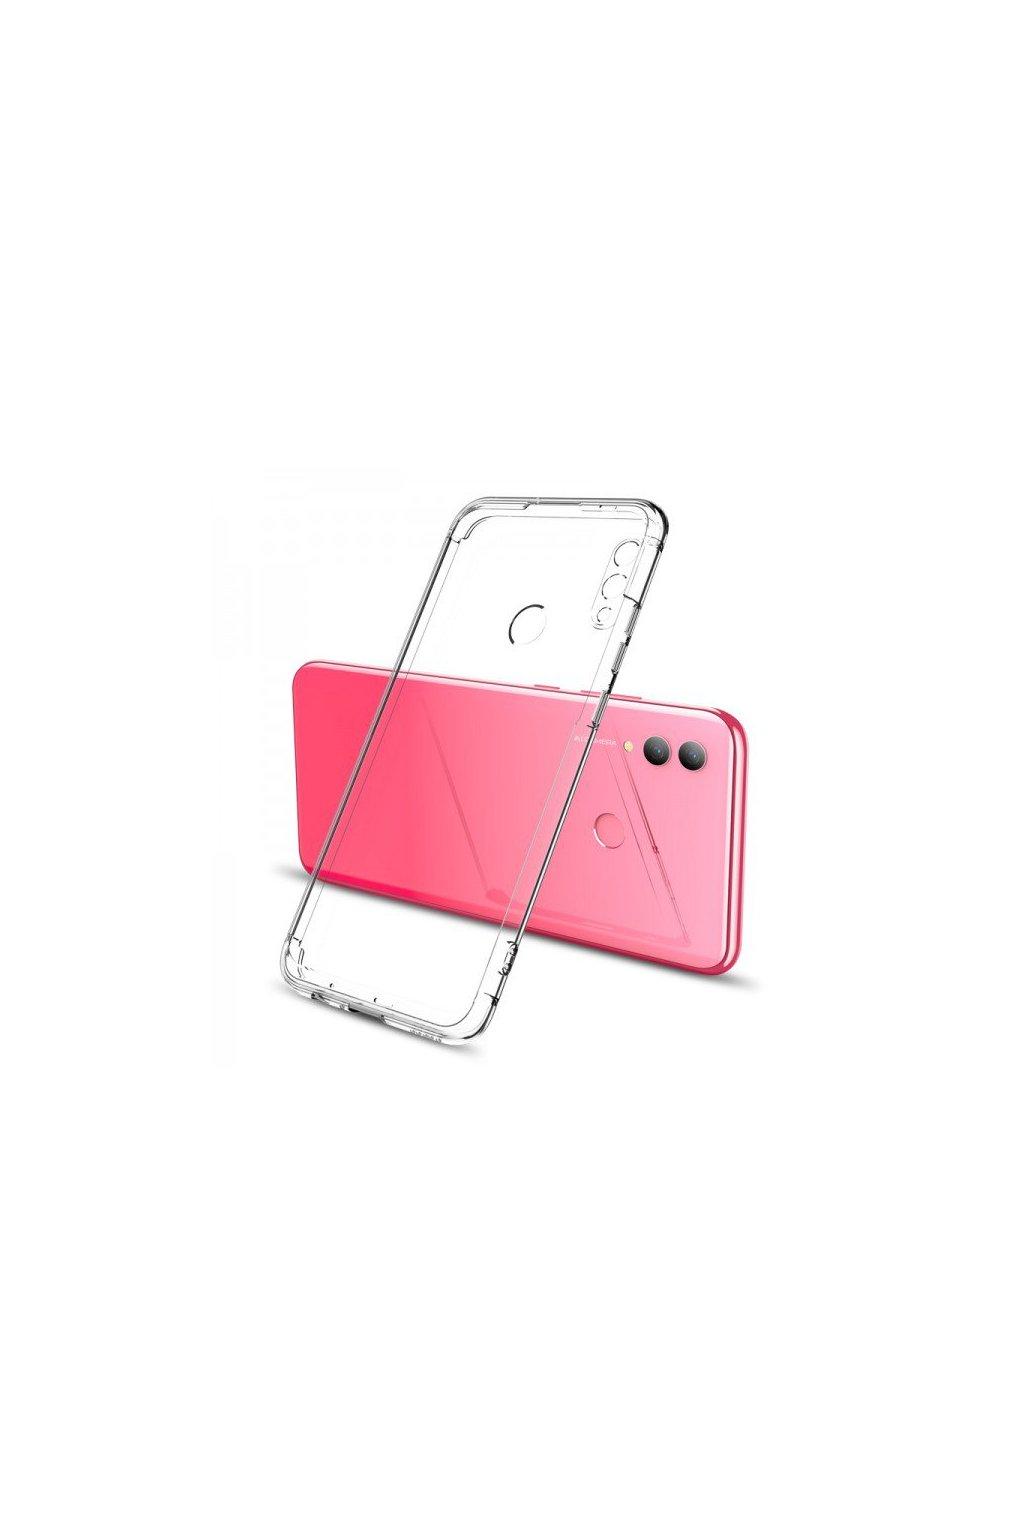 eng pl GKK 360 Phantom Case Front and Back transparent Case Full Body Cover Huawei P Smart 2019 transparent 49744 5